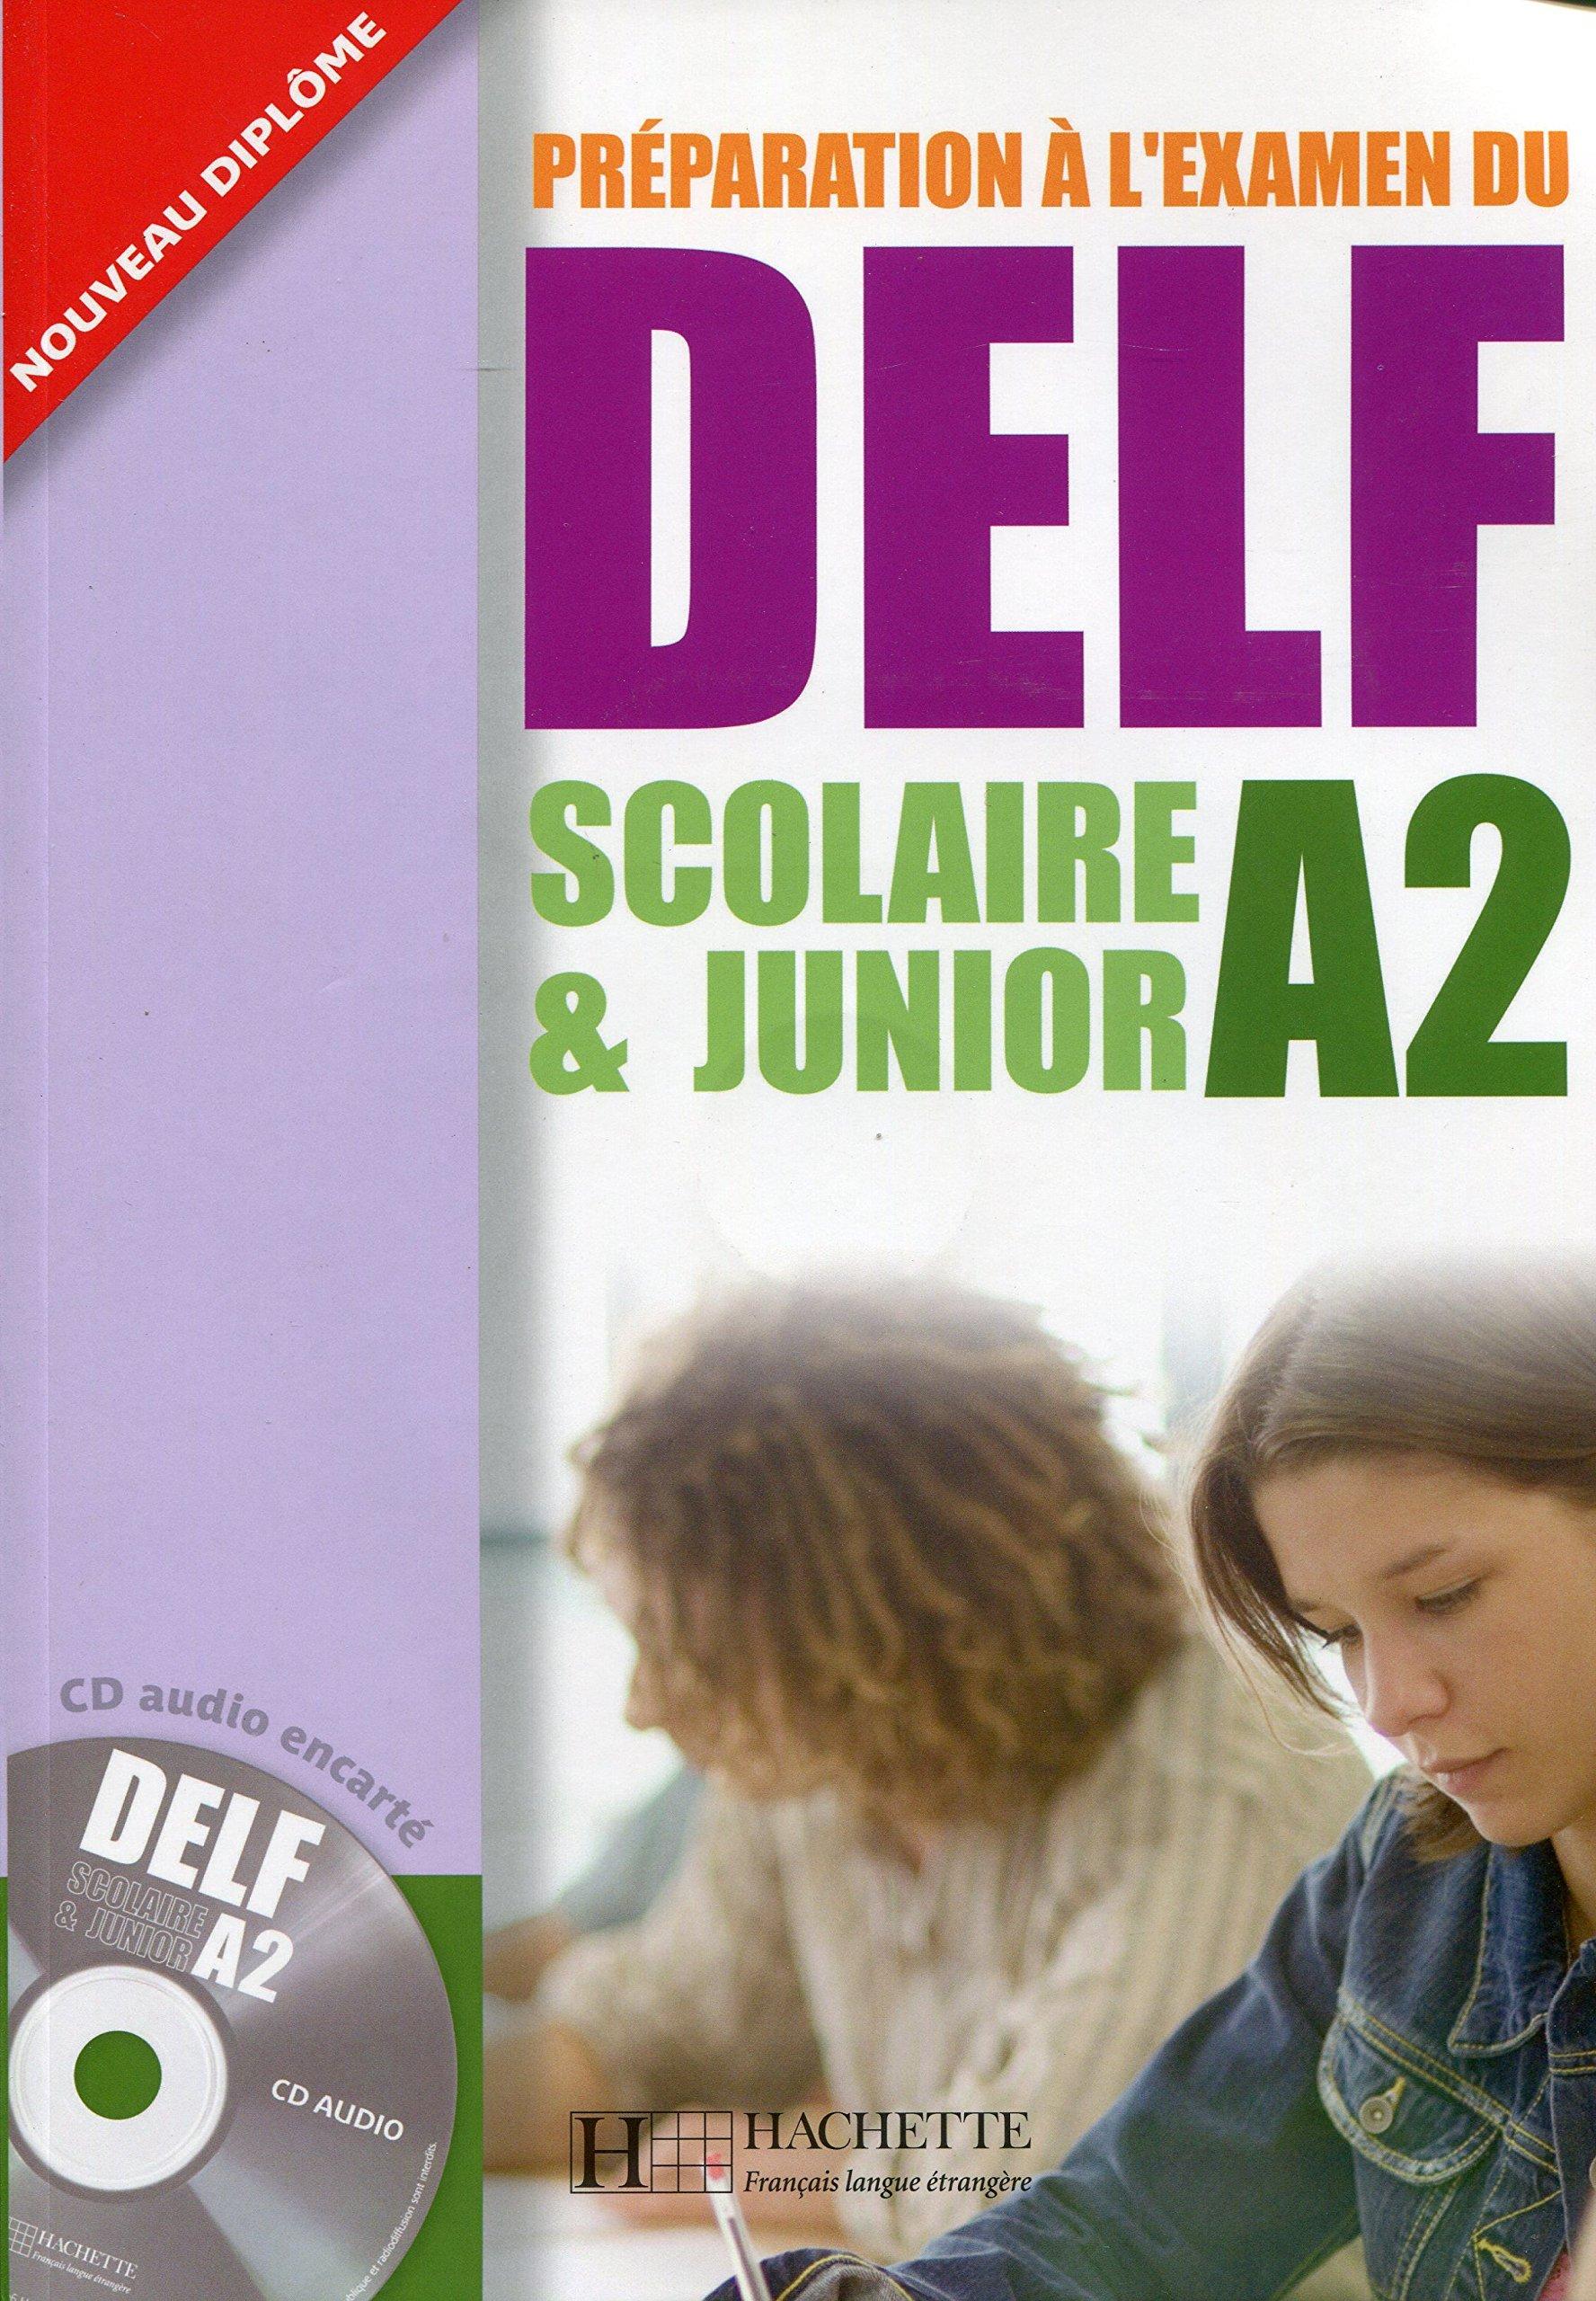 Delf scolaire et junior. A2. Livre de lélève con corrigés. Per le Scuole superiori. Con CD Audio: Amazon.es: Jane Cadwallader: Libros en idiomas ...